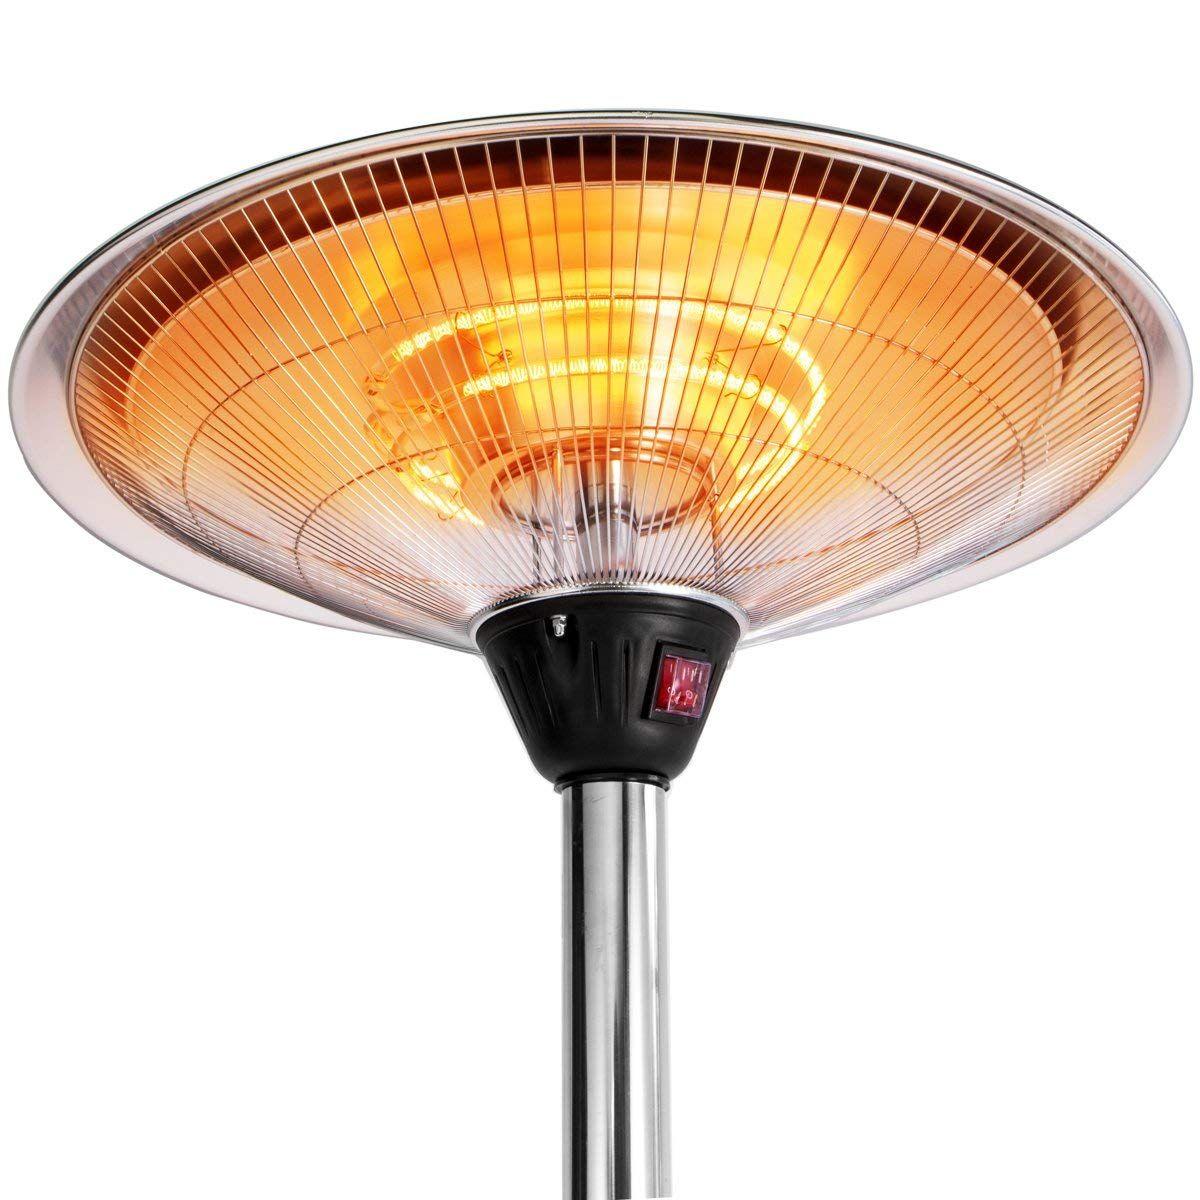 XtremepowerUS Electric 1500 Watt Outdoor Patio Infrared